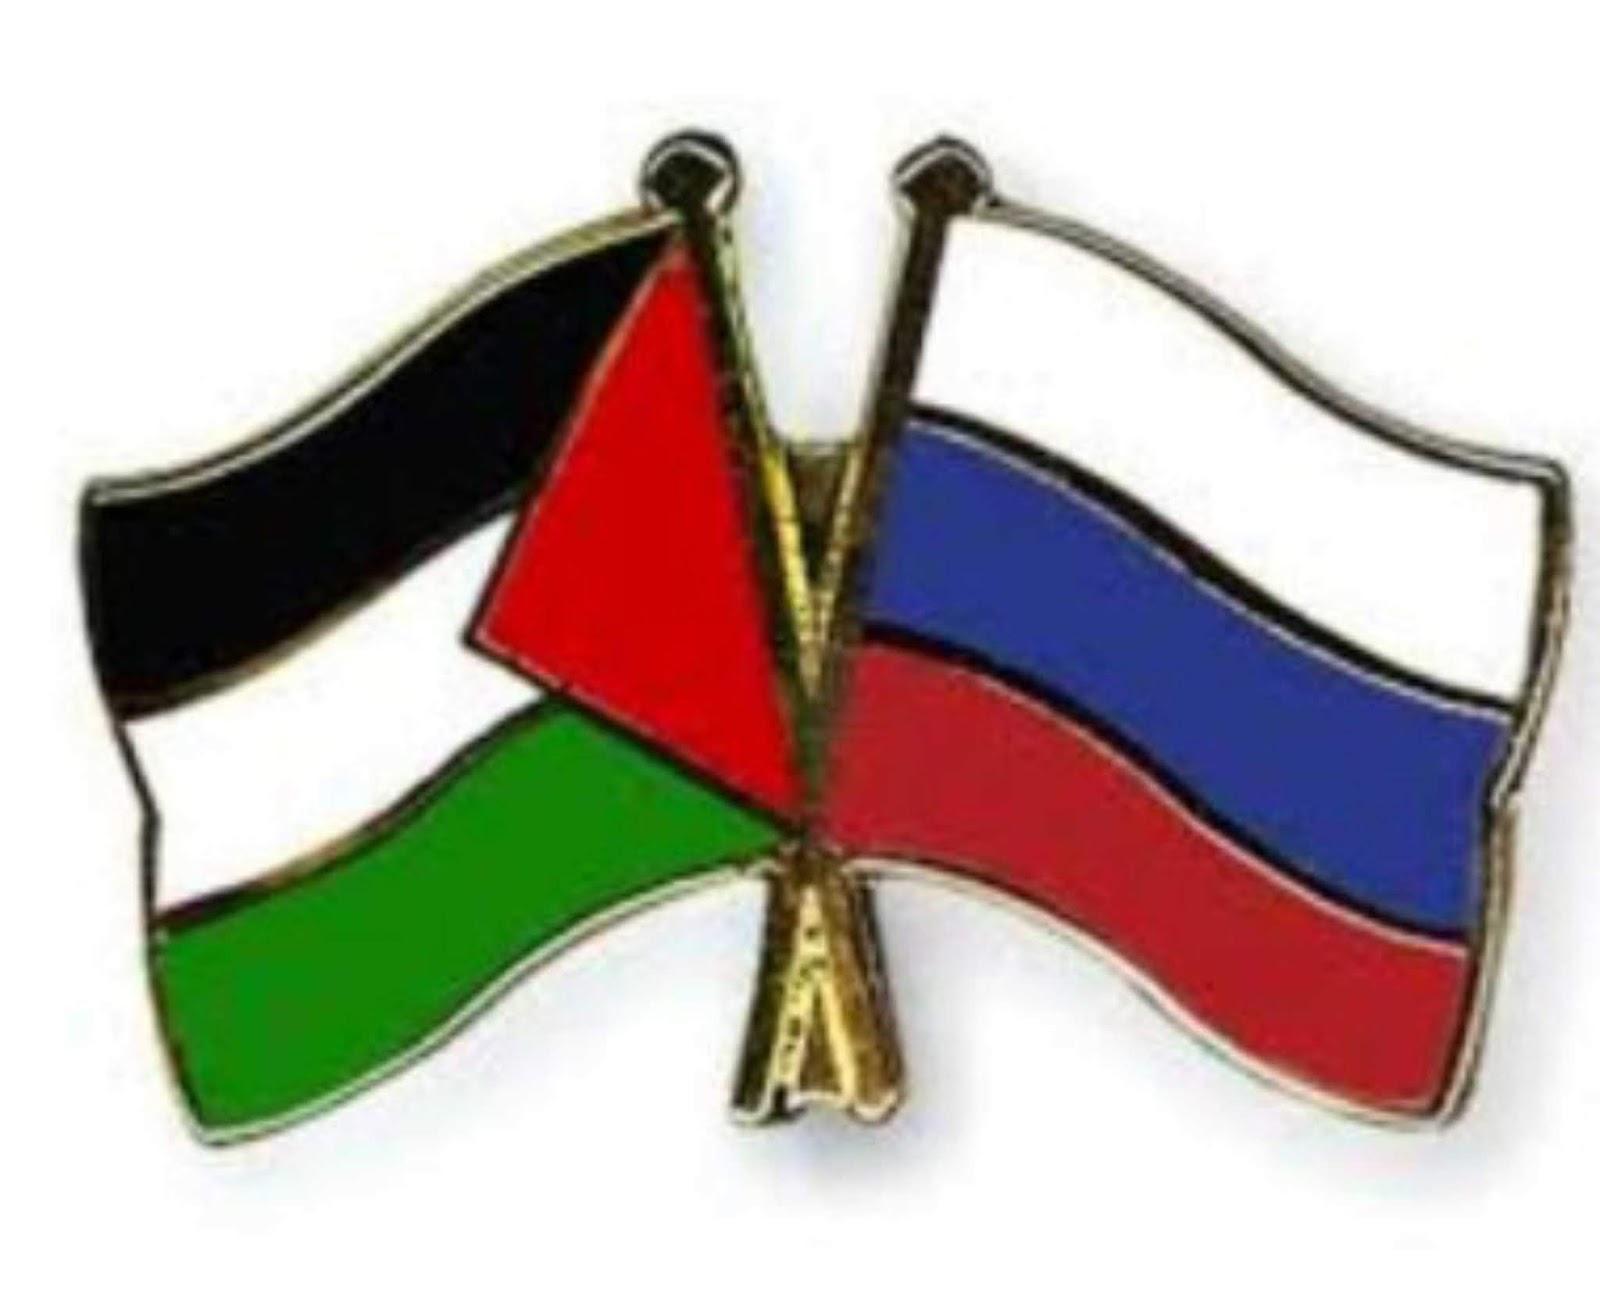 Rusia dan Palestina sepakat untuk melanjutkan dialog tentang isu-isu Timur Tengah